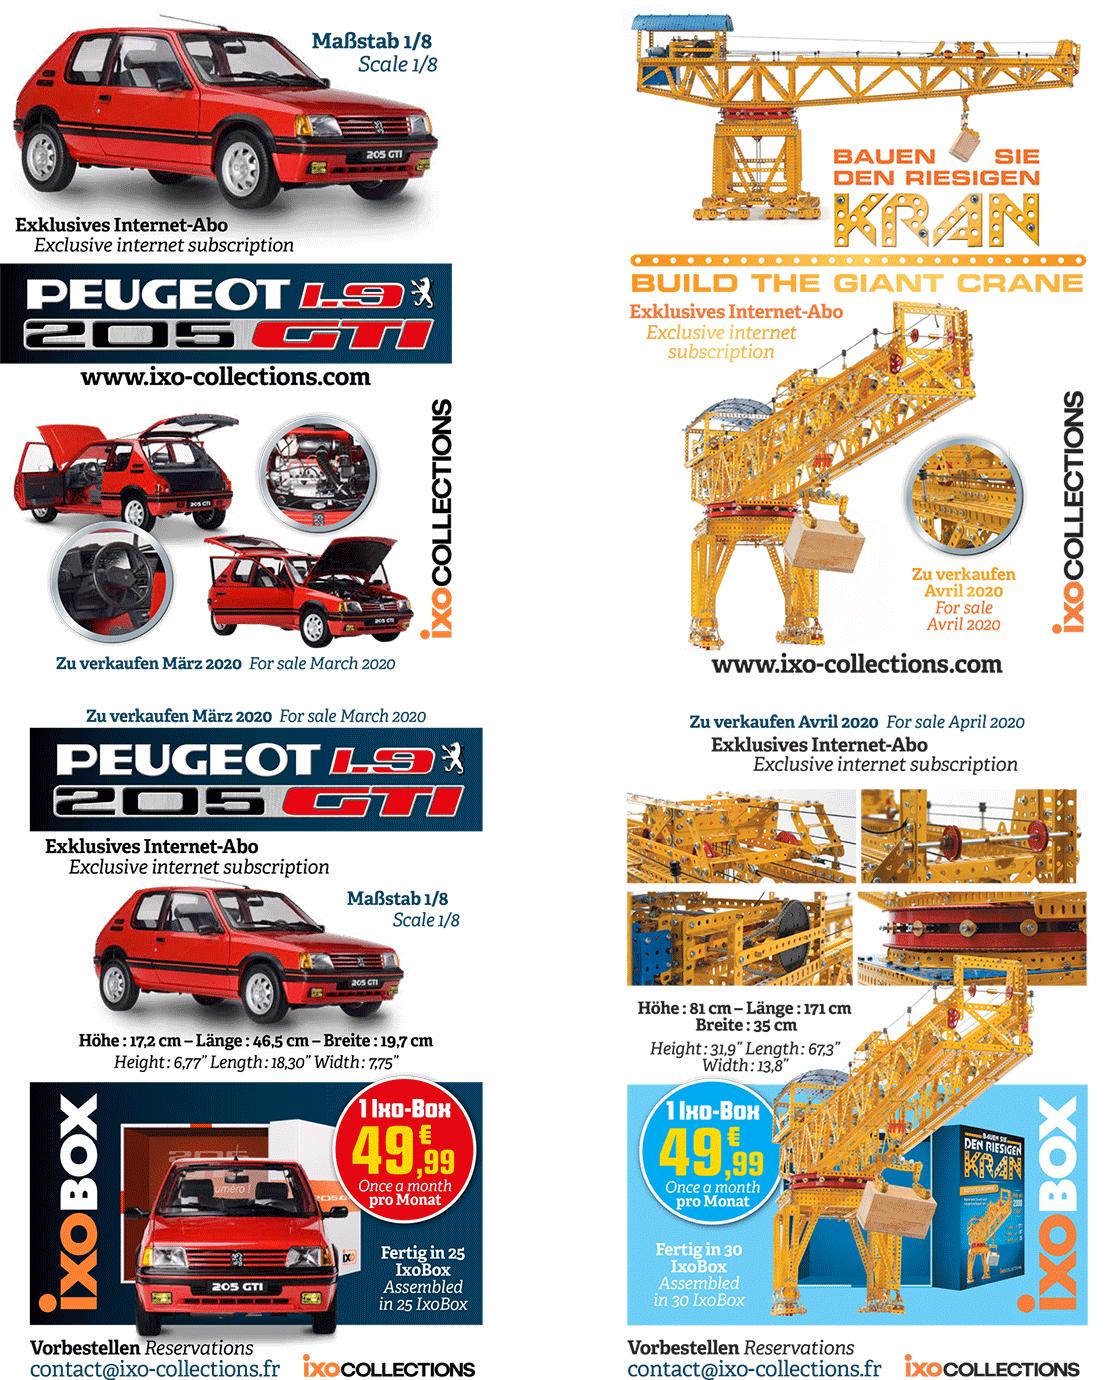 205 GTI 1.9 au 1/8eme - Page 2 Products